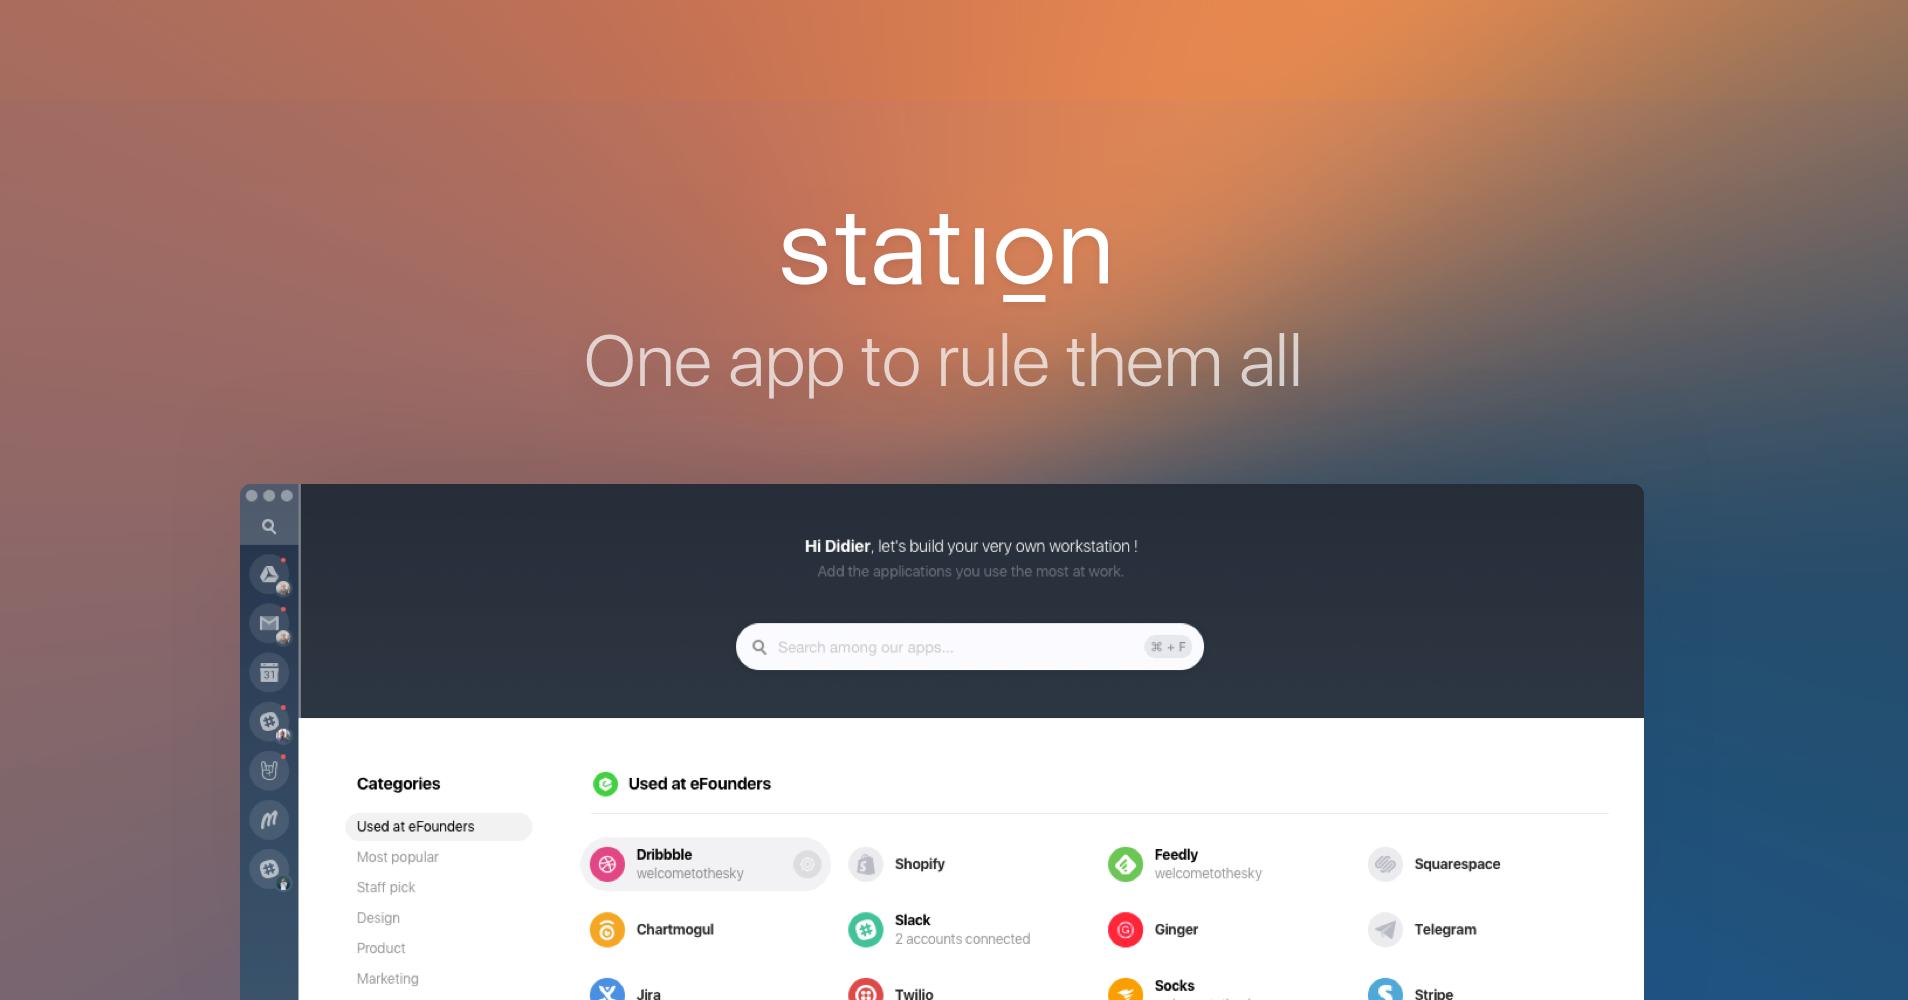 station from getstation.com